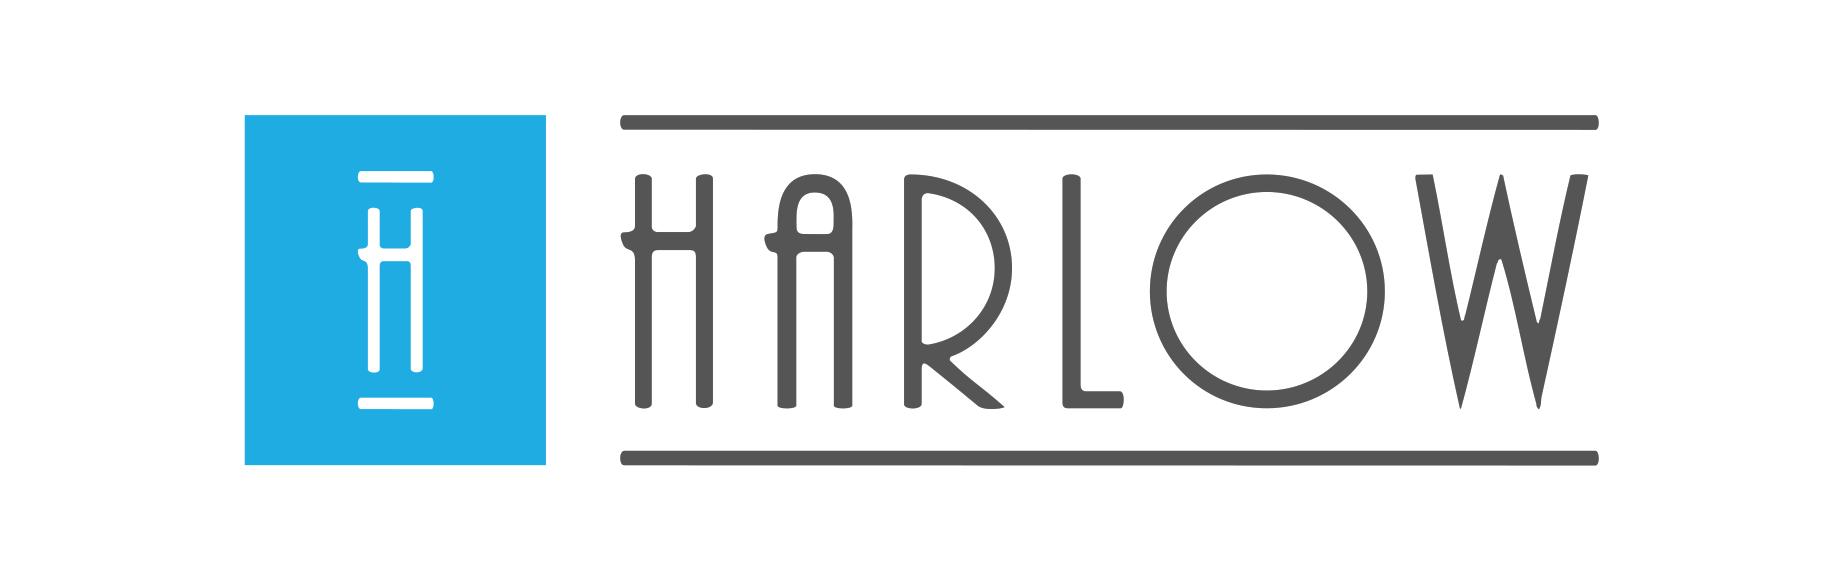 Harlow Luxury Apartment Homes Logo